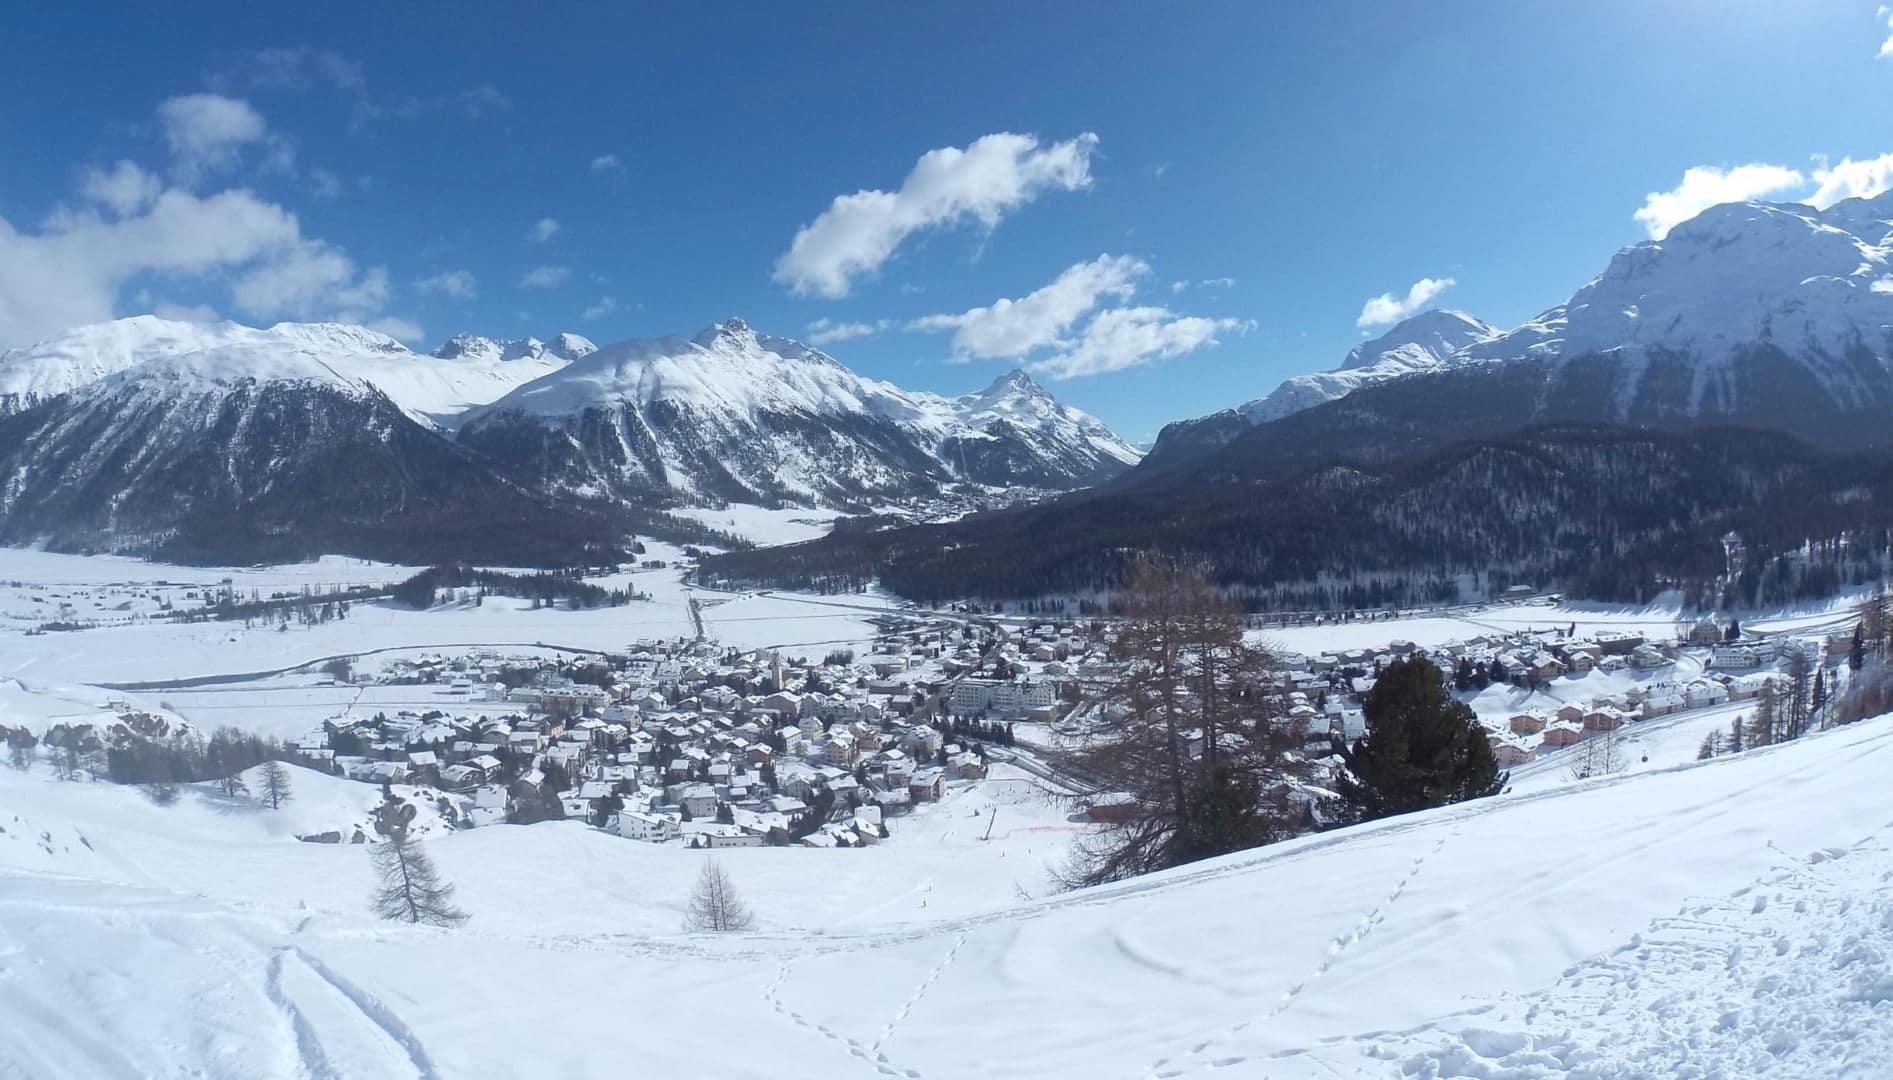 wintersport en aanbiedingen in St. Moritz